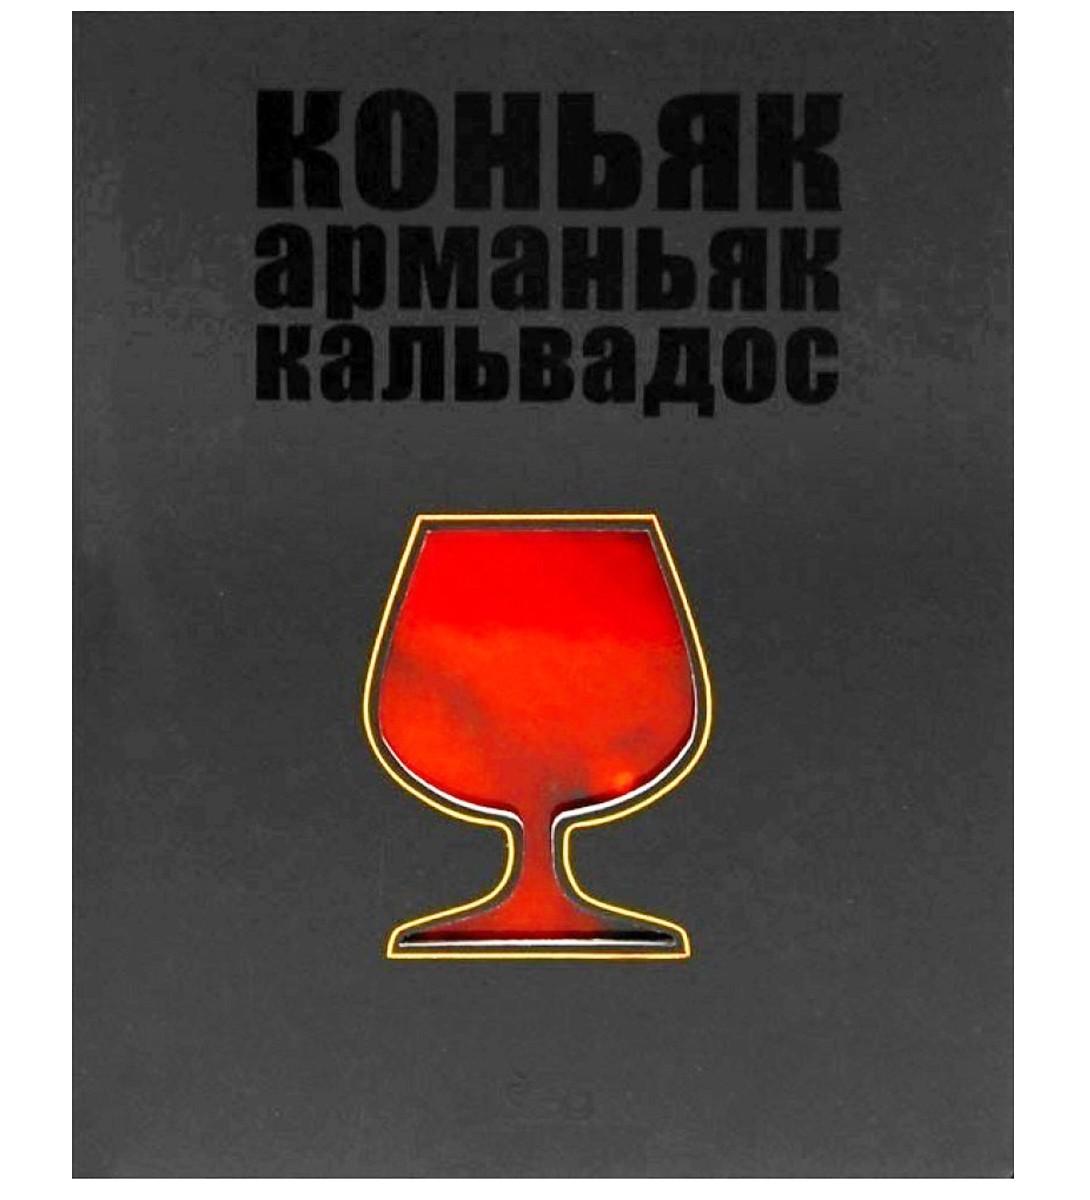 Книга Коньяк. Арманьяк. Кальвадос. Євген Кручіна 2012 фото